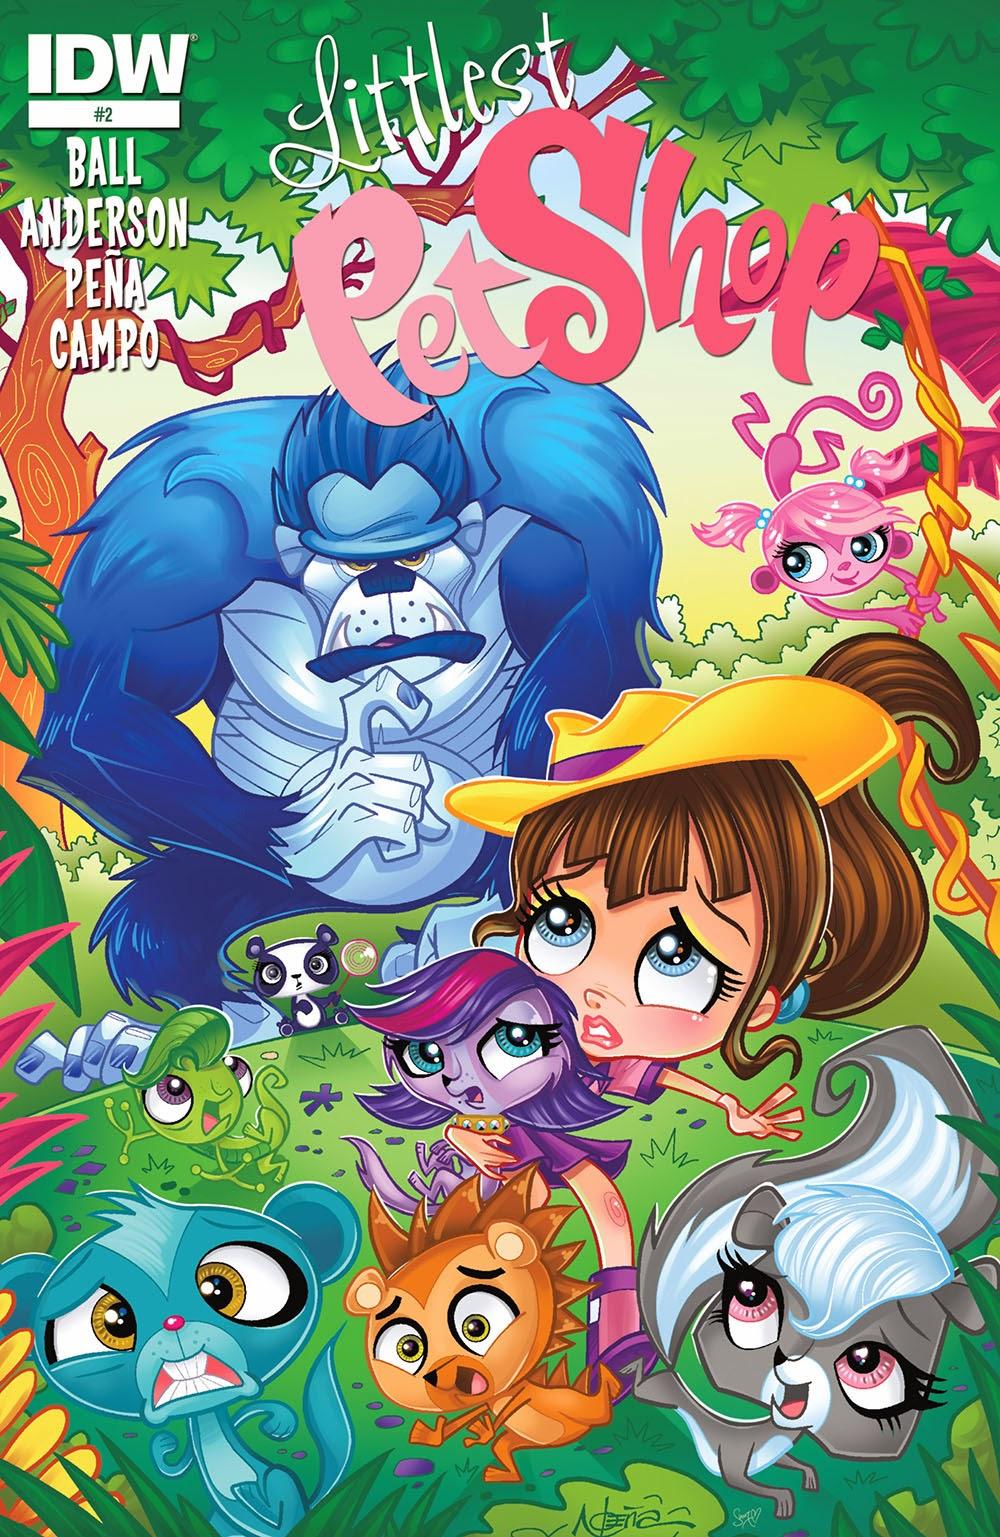 Littlest pet shop 002 2014 viewcomic reading comics inshare voltagebd Gallery